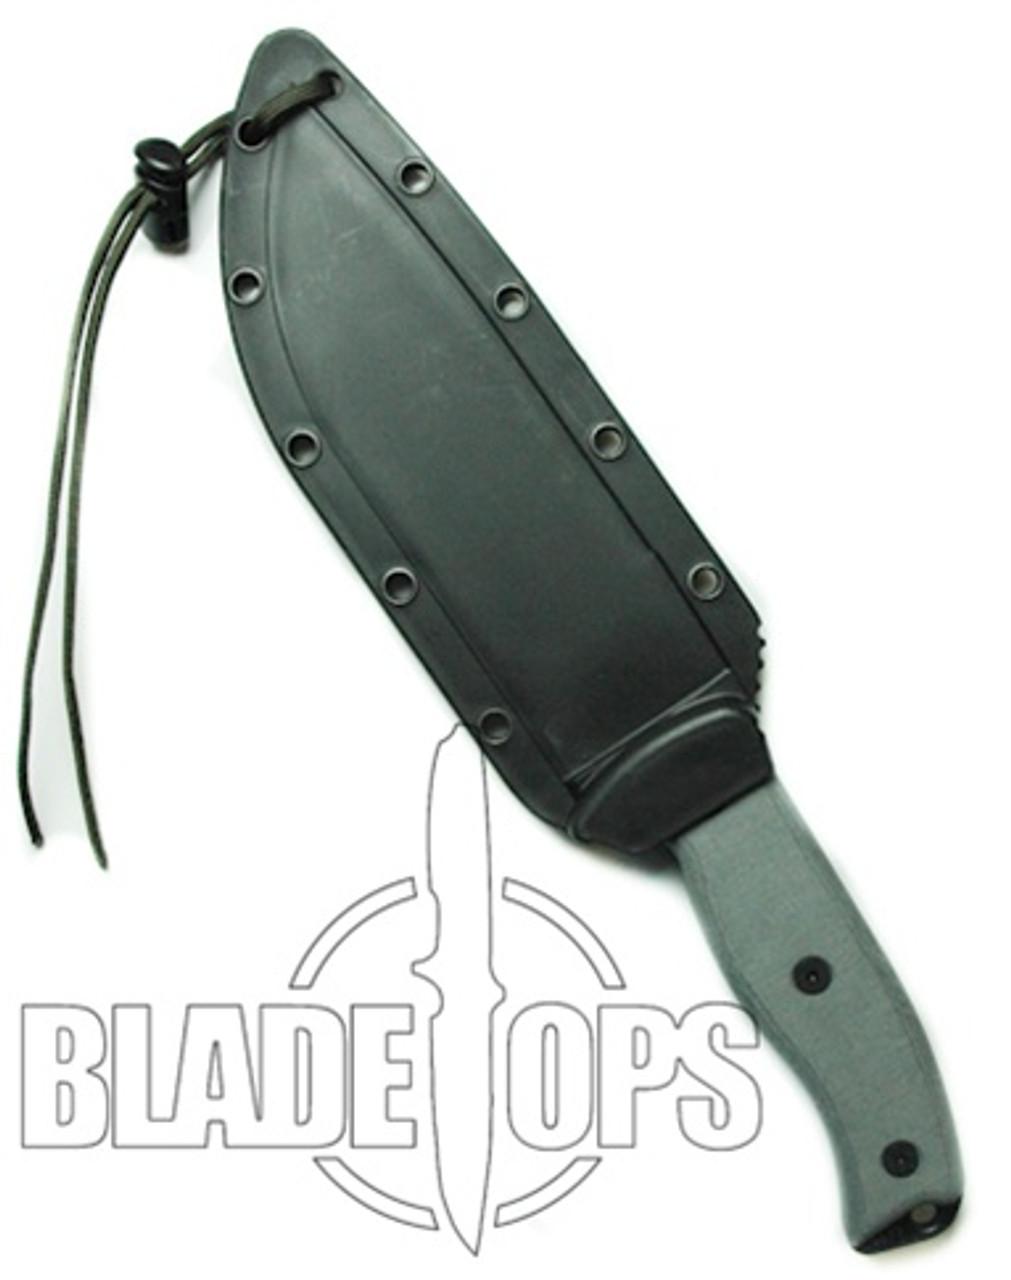 ESEE Knives ESEE-6 Fixed Blade Knife, Black Blade, Linen Micarta Handle, Black Sheath, ESEE-6P-B